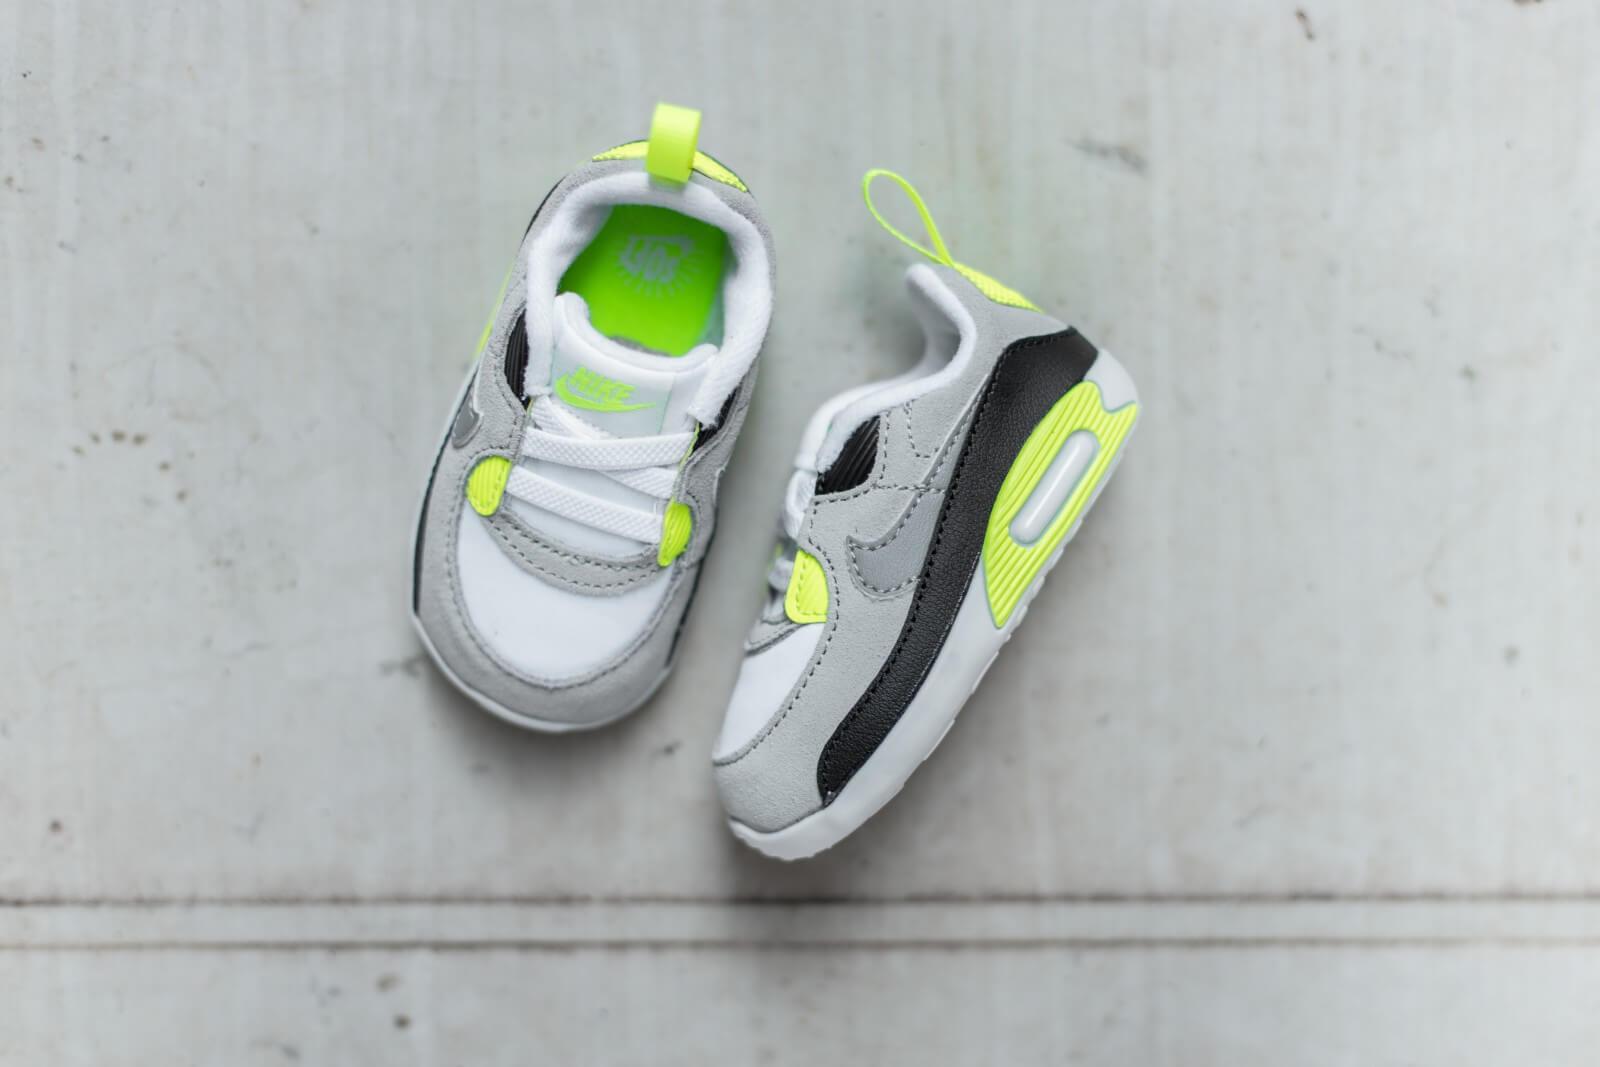 Nike Air Max 90 Crib White/Particle Grey-LT Smoke Grey-Volt